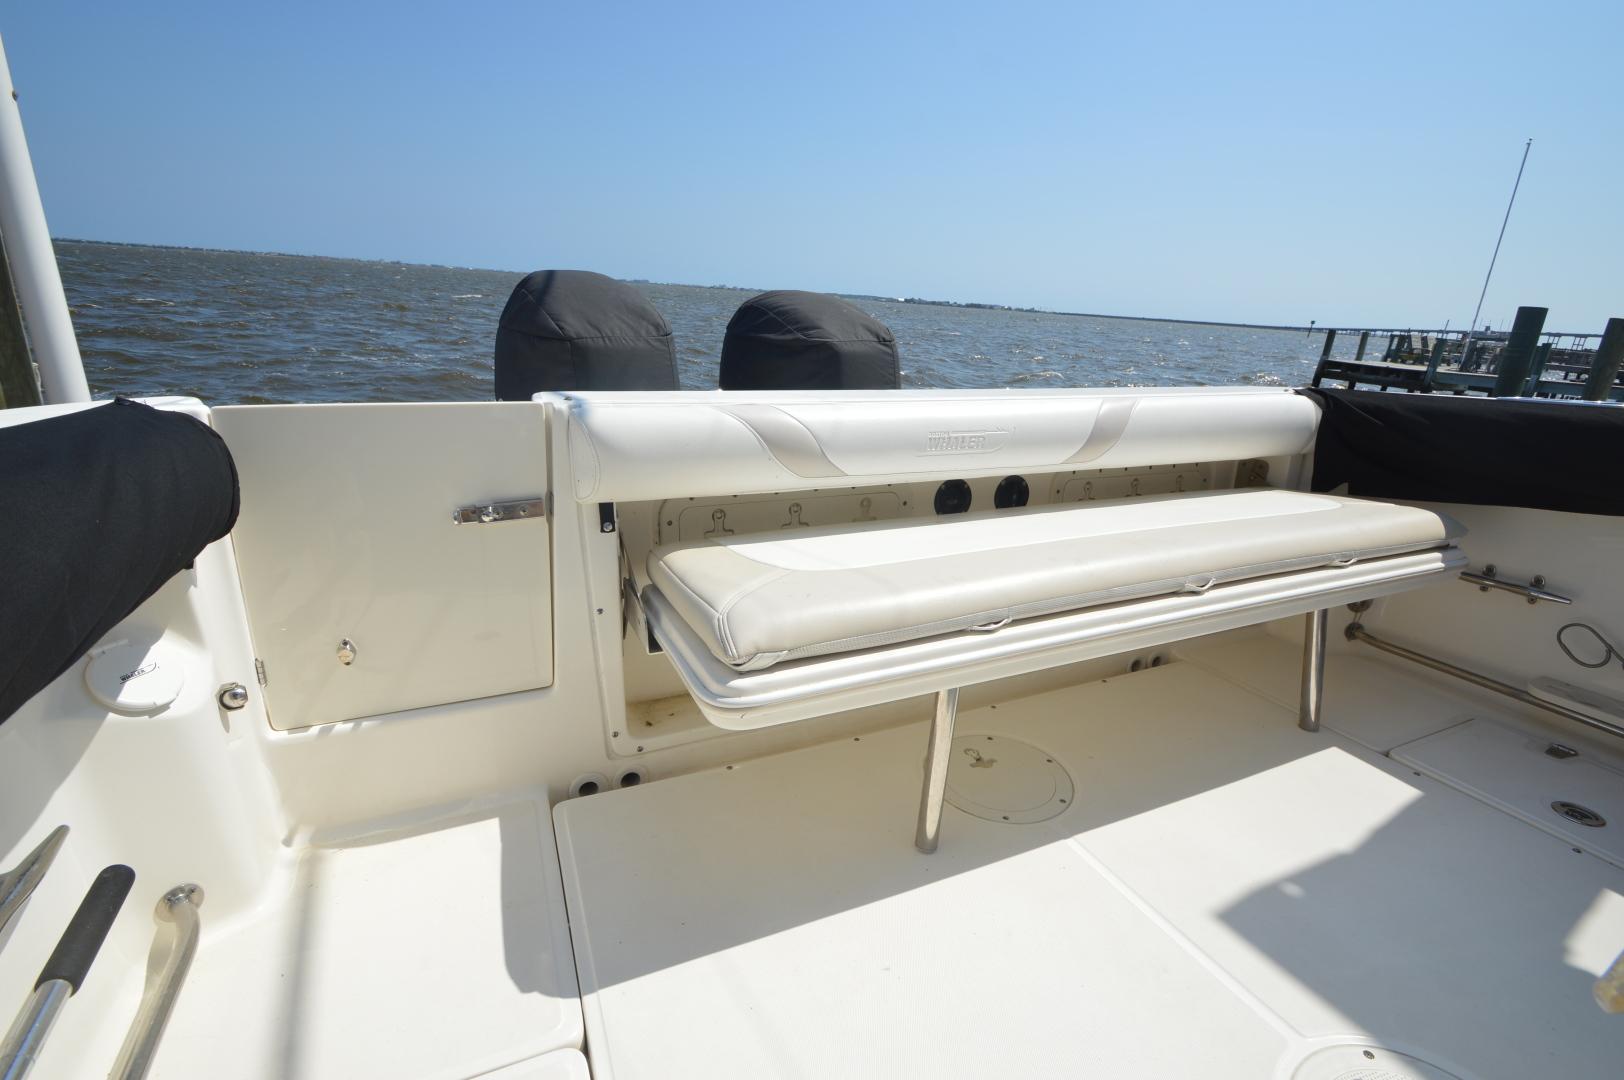 Boston Whaler-320 Outrage 2008 -Manteo-North Carolina-United States-1485484 | Thumbnail